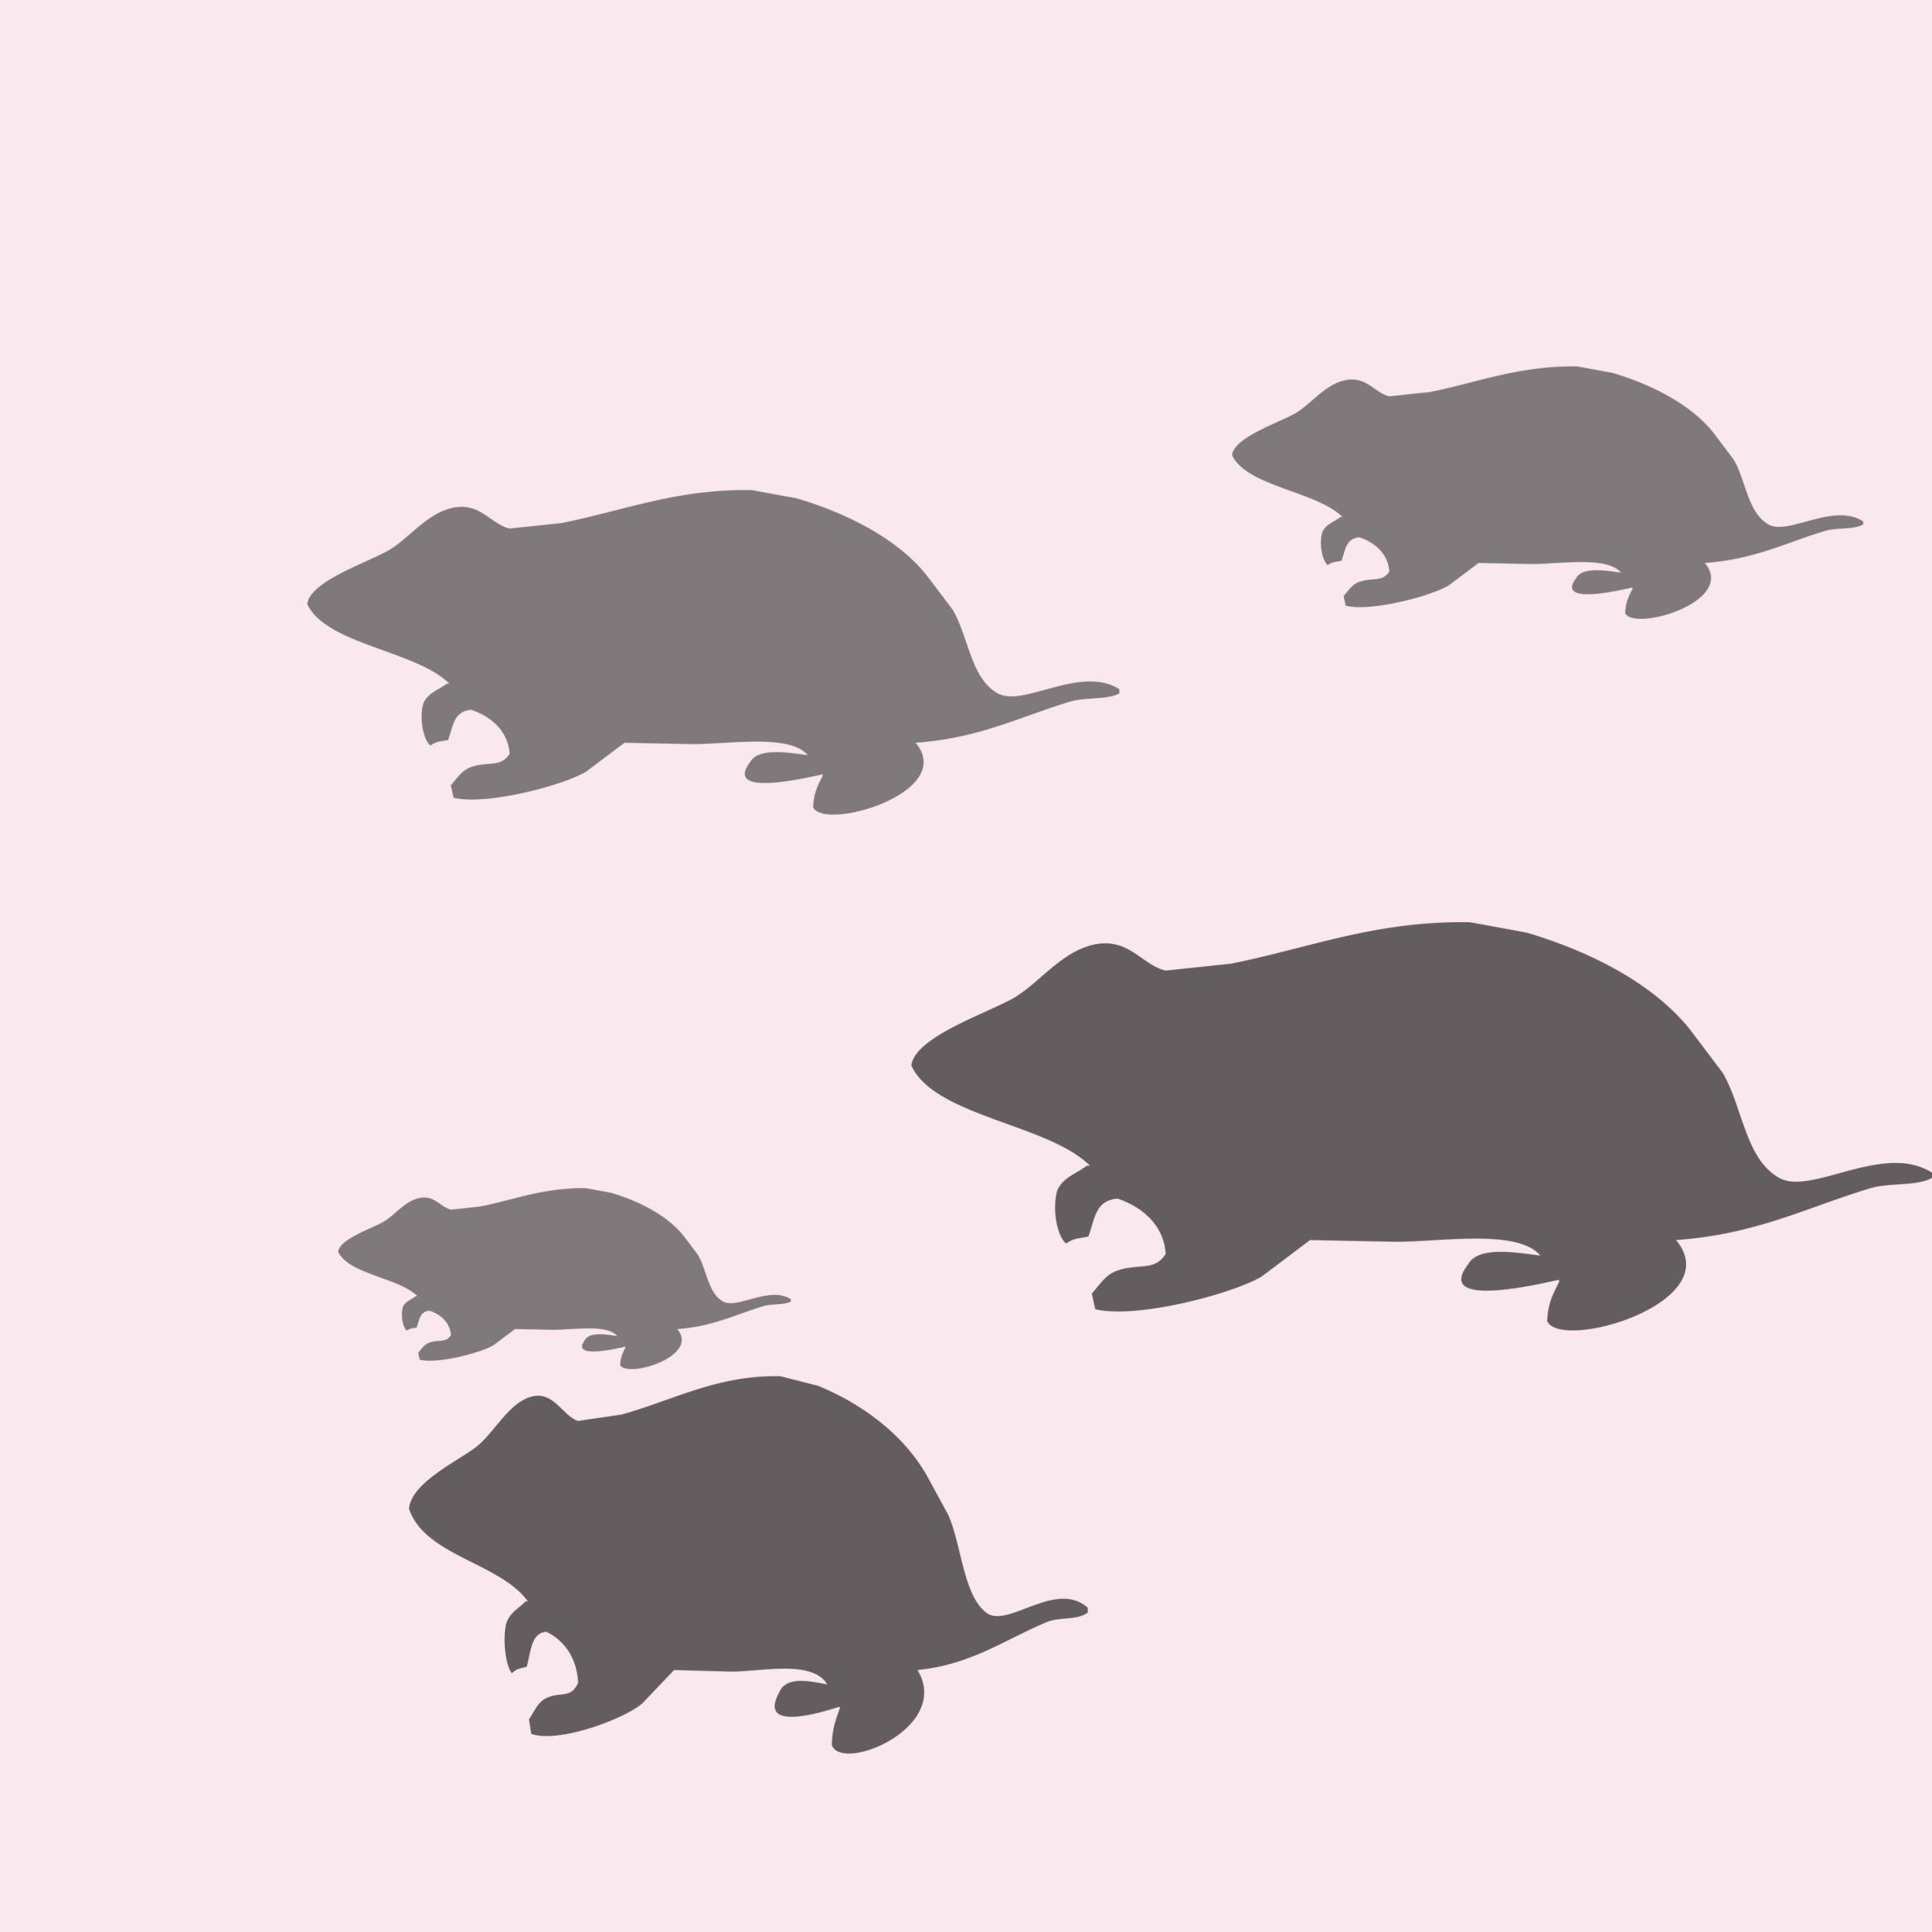 Rats illustration